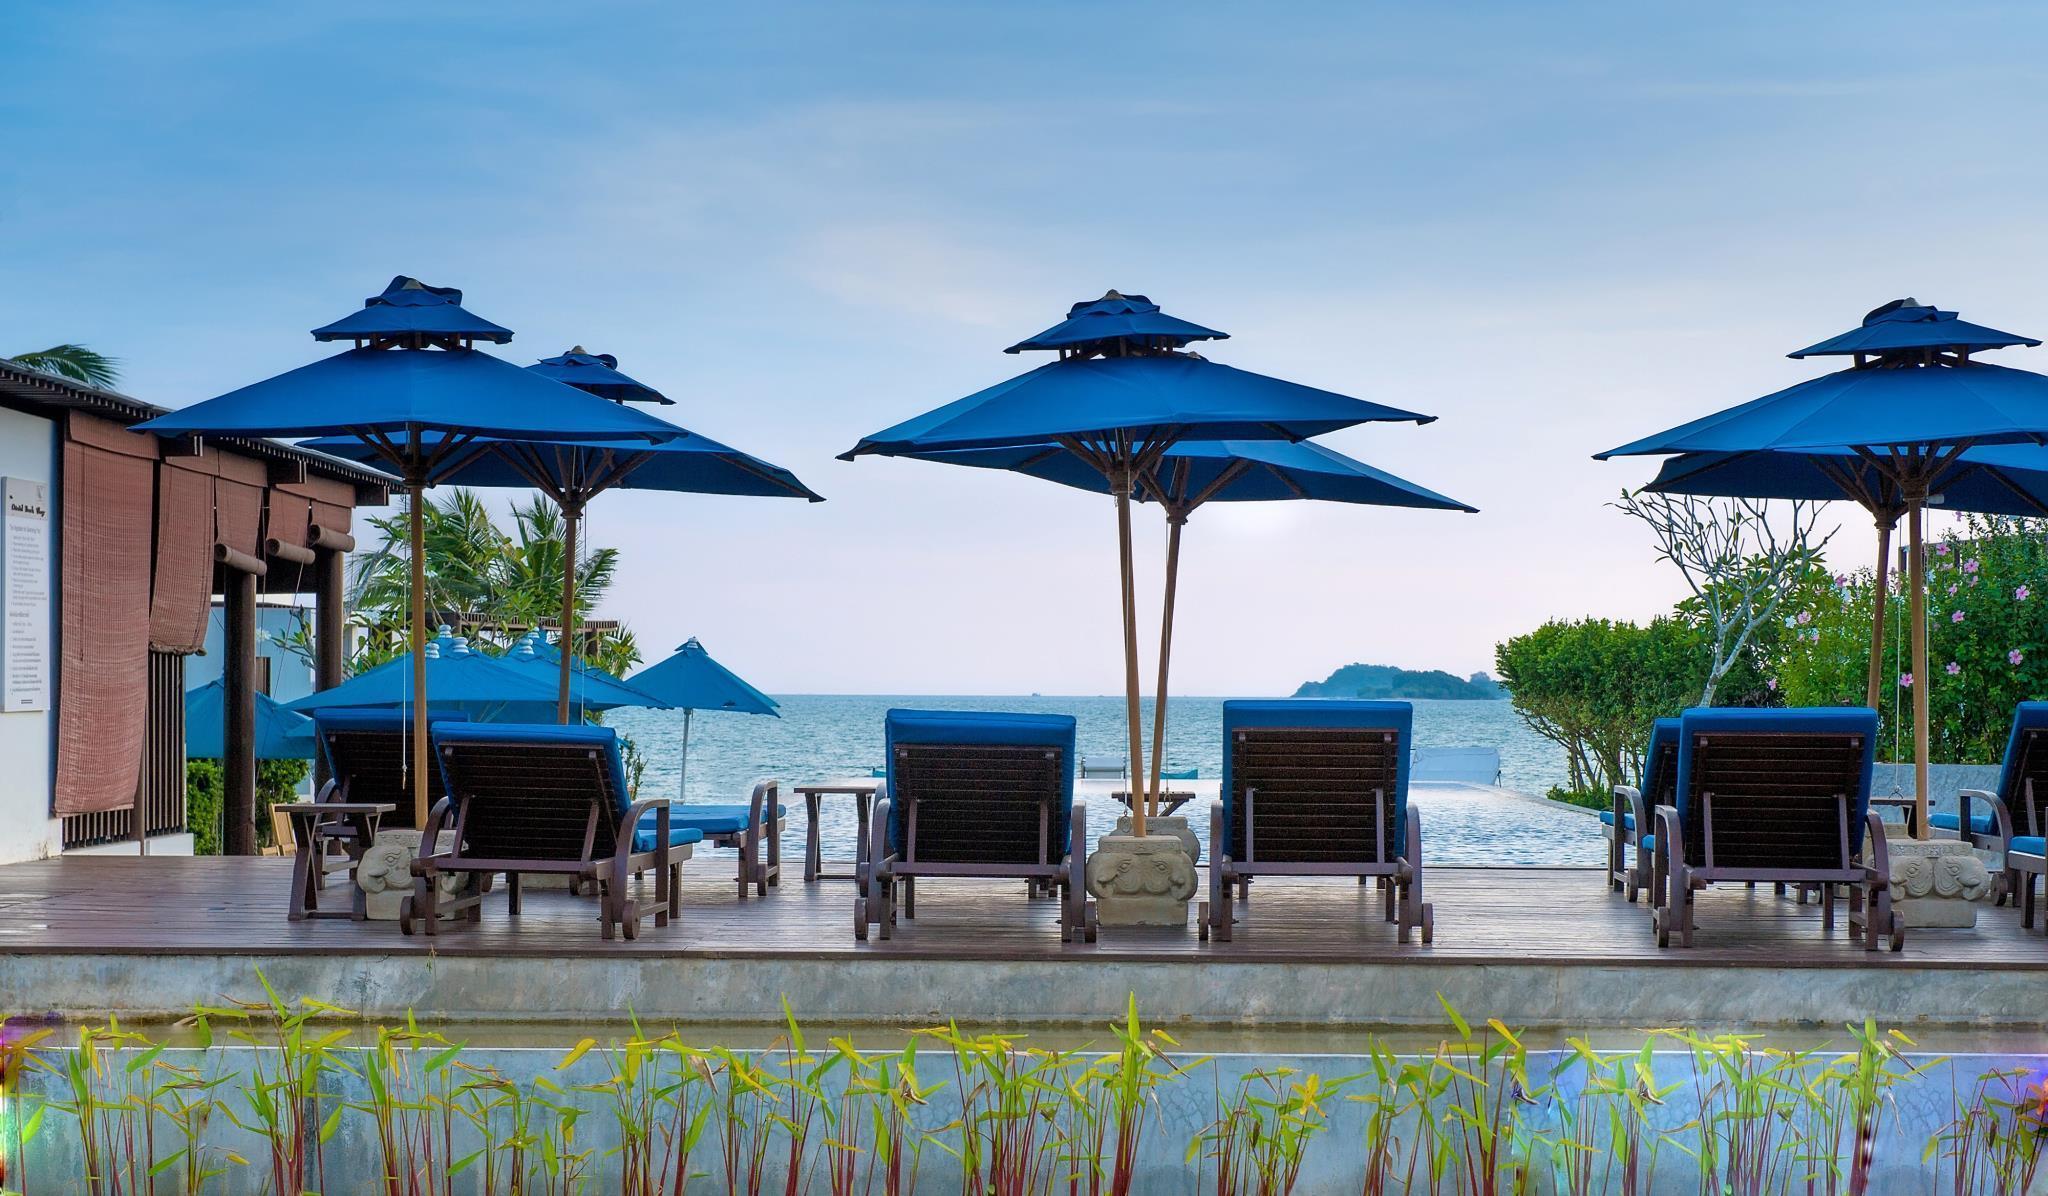 The Oriental Beach Resort ดิ โอเรียนทอล บีช รีสอร์ท